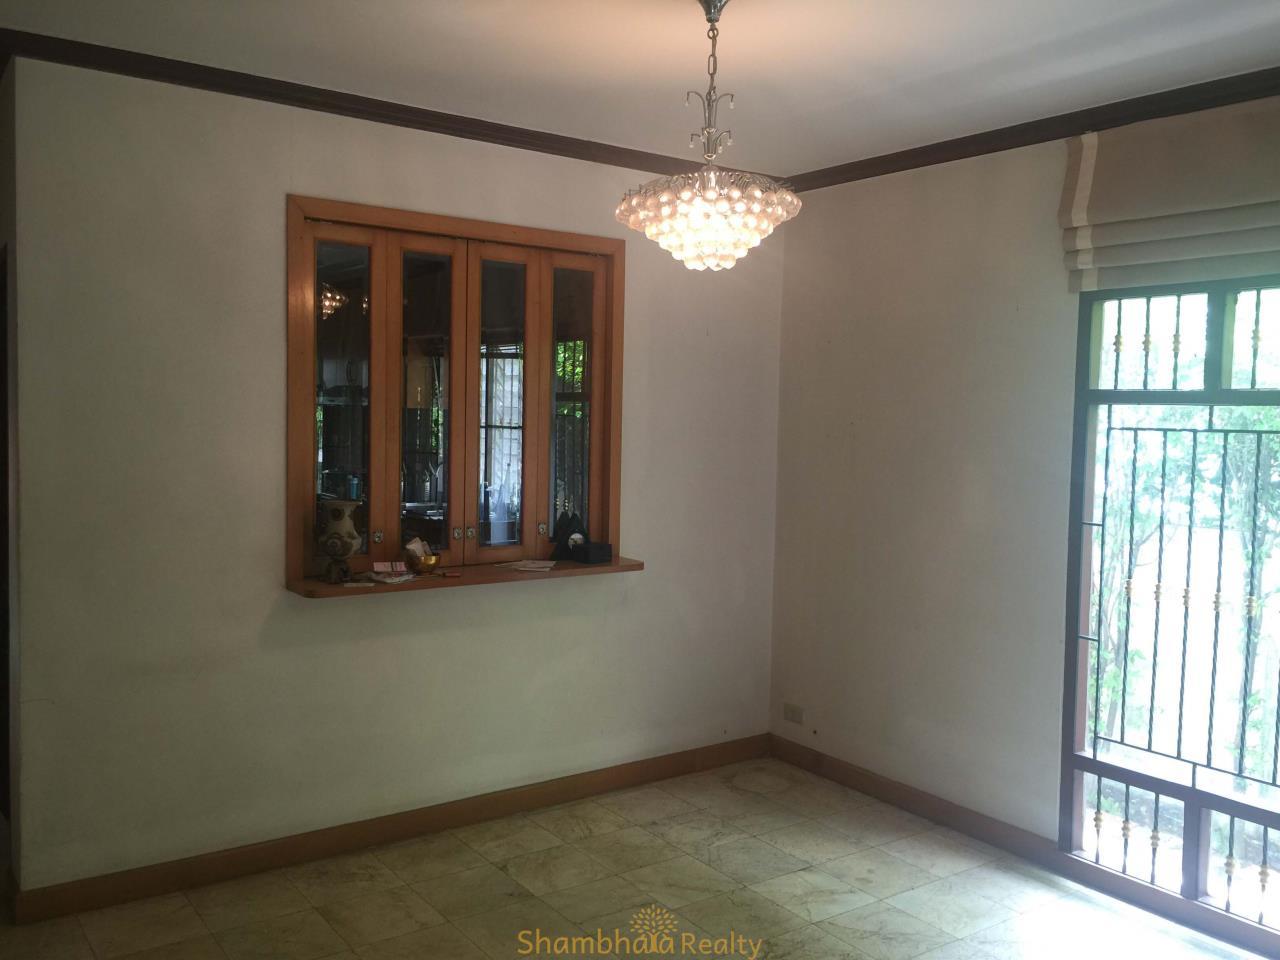 Shambhala Realty Agency's house is near Suvarnabhumi airport Condominium for Sale in Andress is 21 Romklow road 19/1 Kwangklongsam pravet, Khet Ladkrabang, Suvarnabhumi airport 11